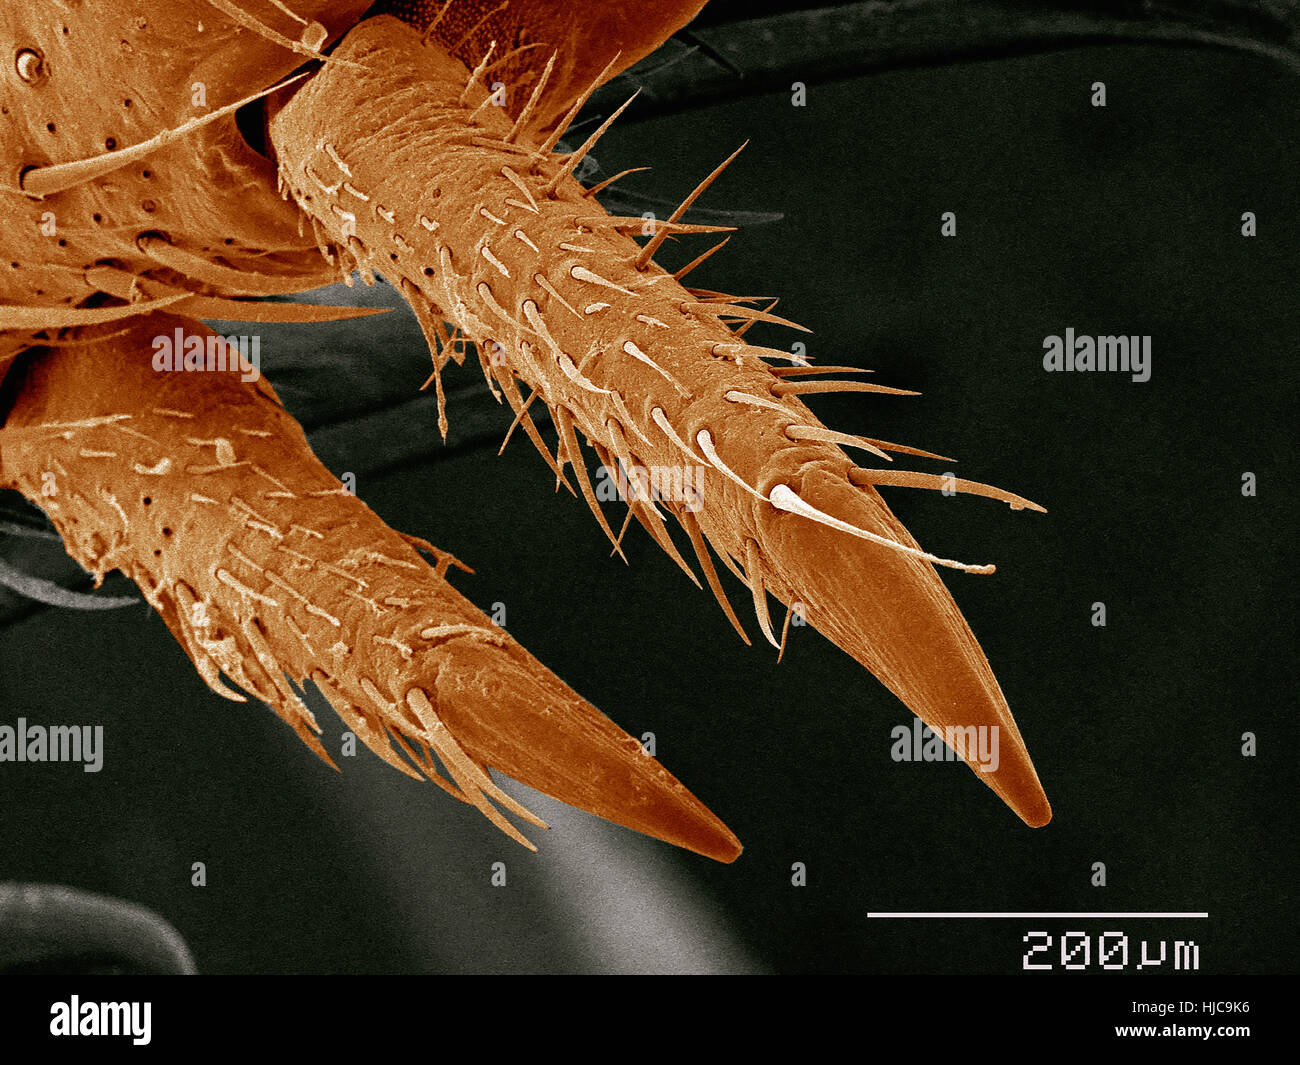 Tarsal claws of house cricket, Acheata sp - Stock Image